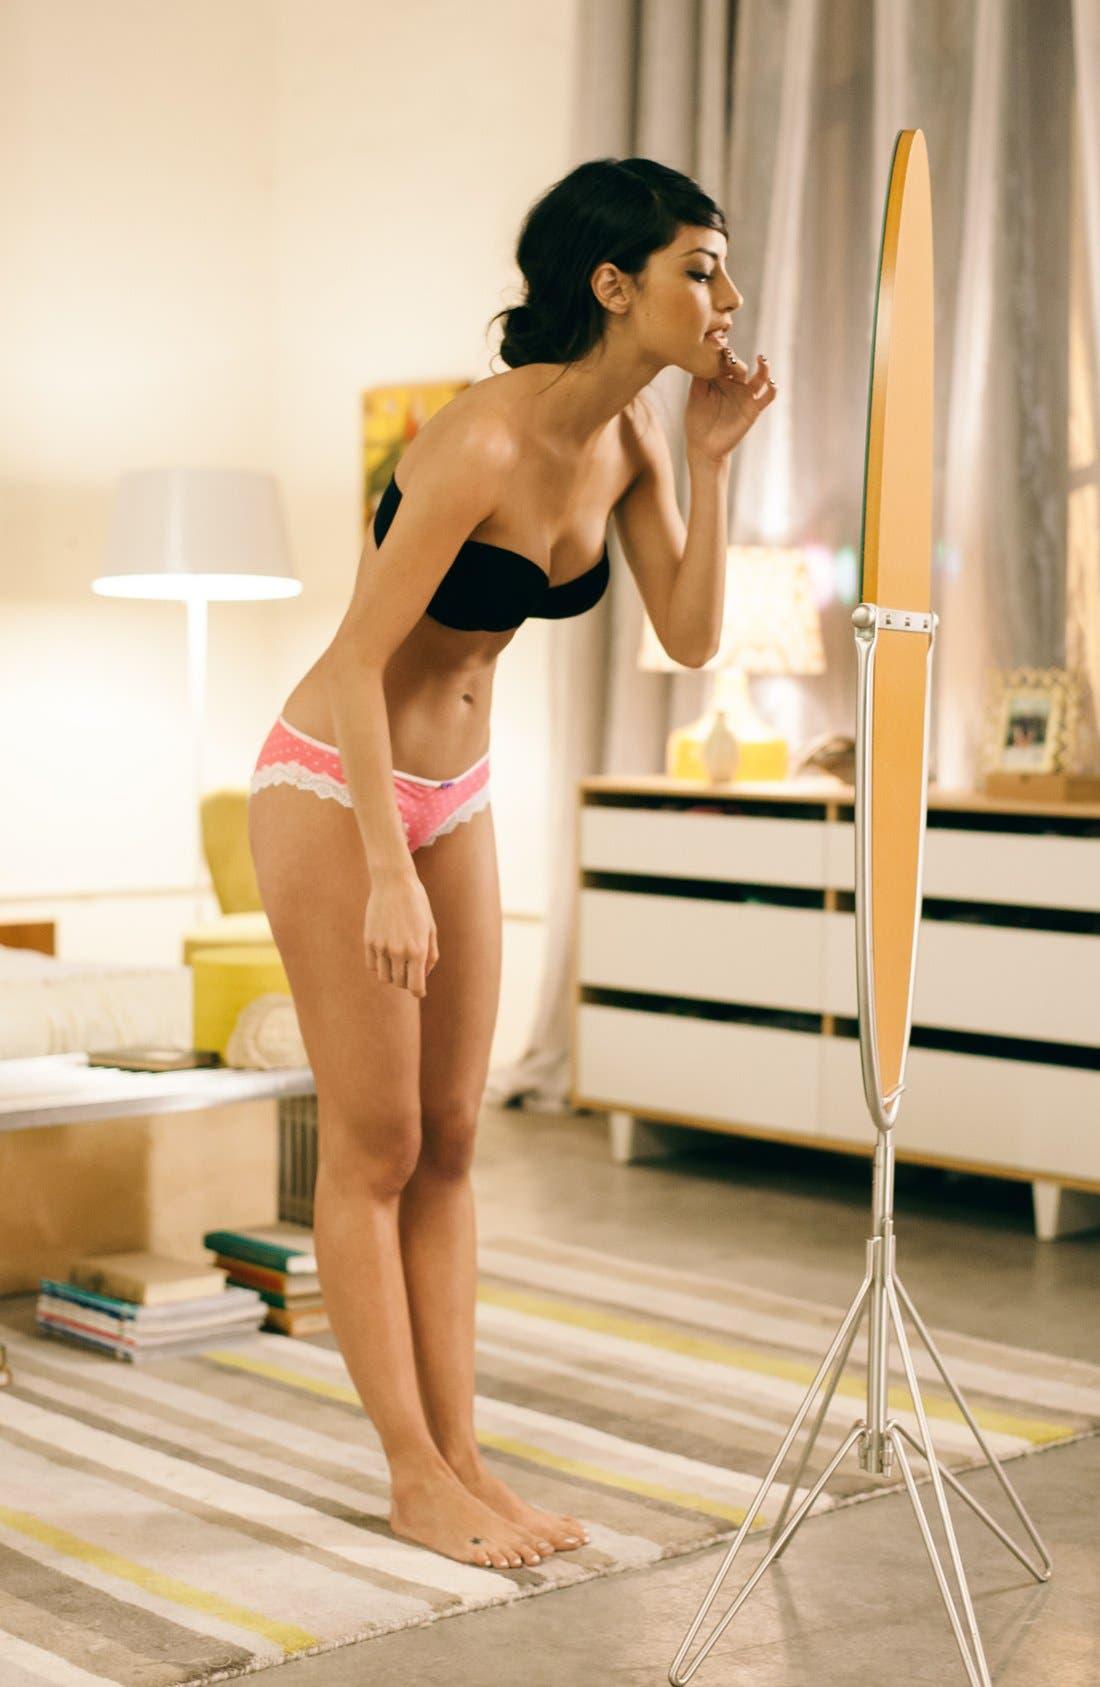 Alternate Image 3  - Calvin Klein 'Naked Glamour' Convertible Strapless Push-Up Bra